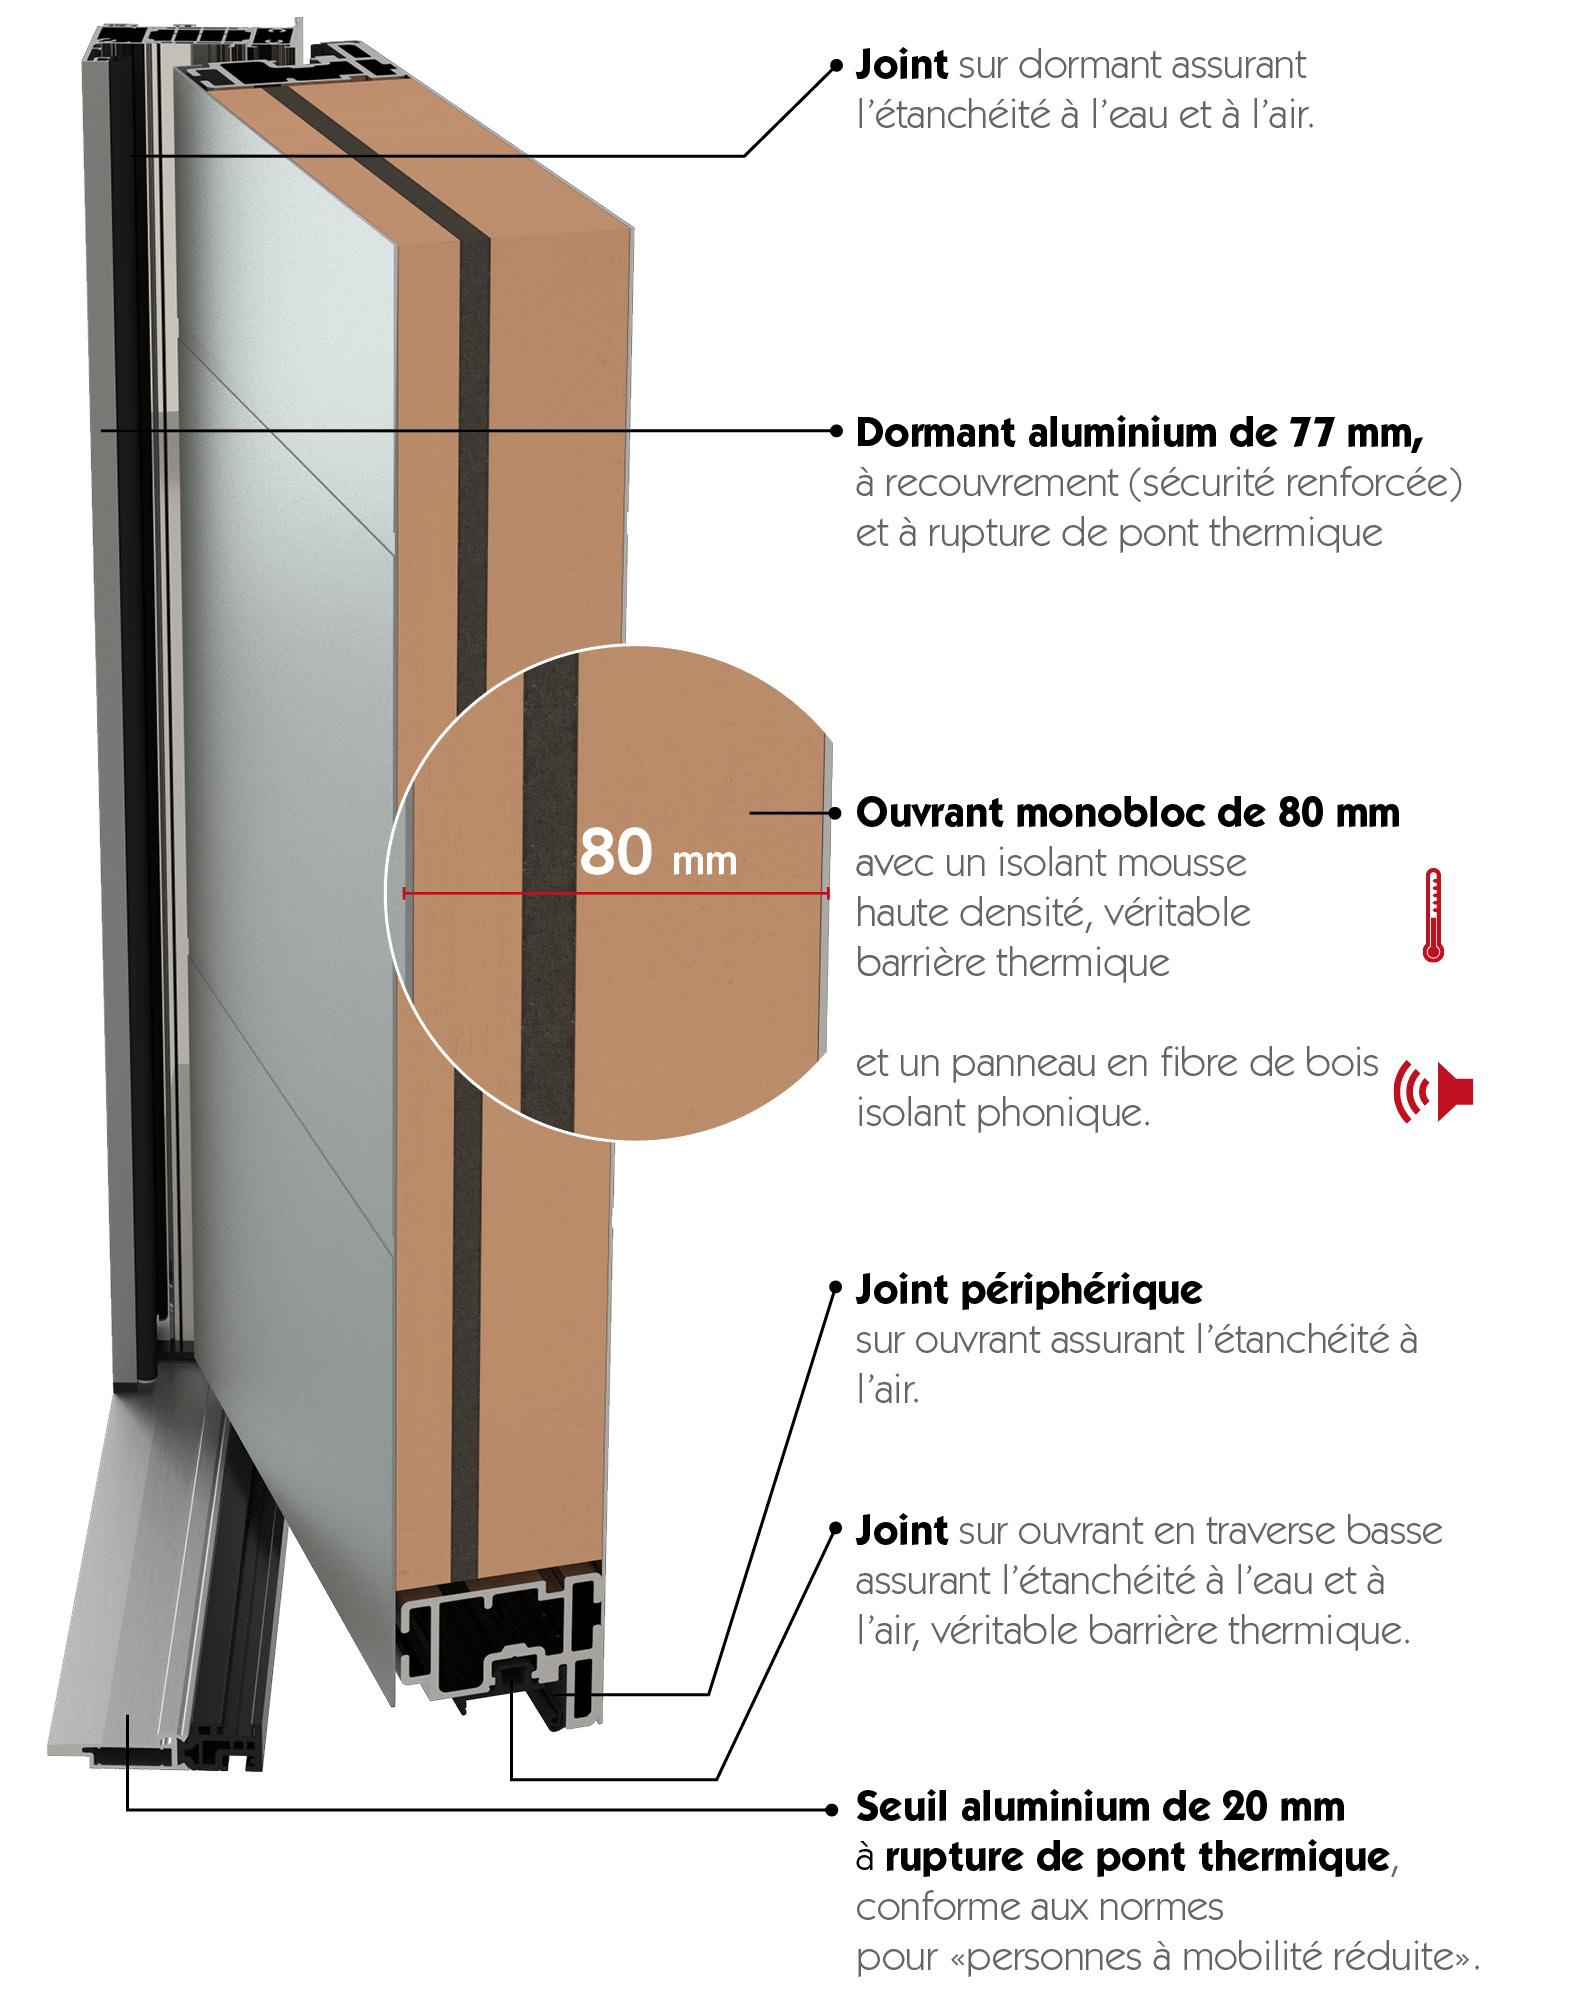 5_belm Porte Dentree Aluminium Oxygene Conception ... Idees Impressionnantes